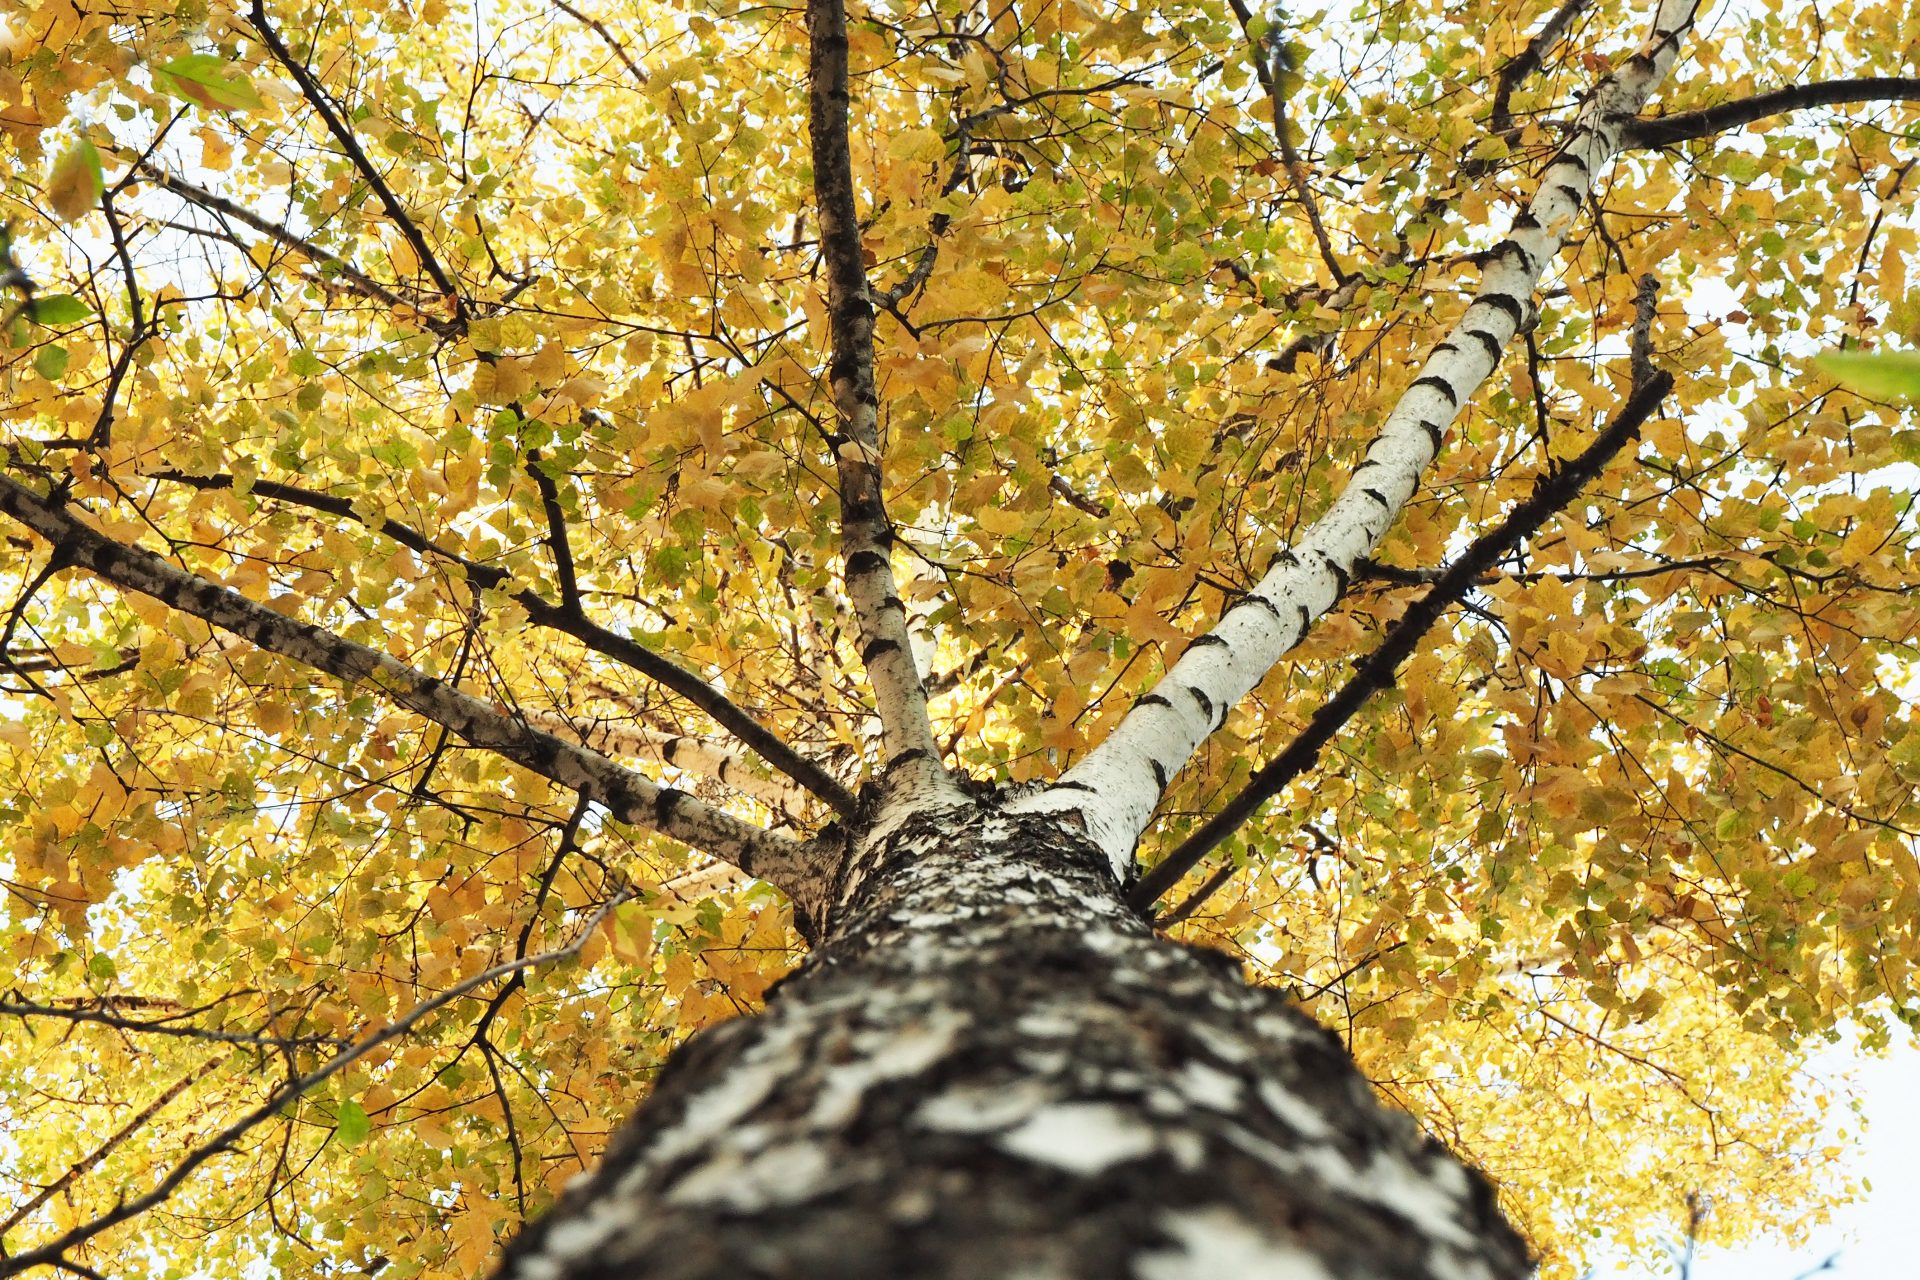 breza-kora-strom-listy-jesen-konare